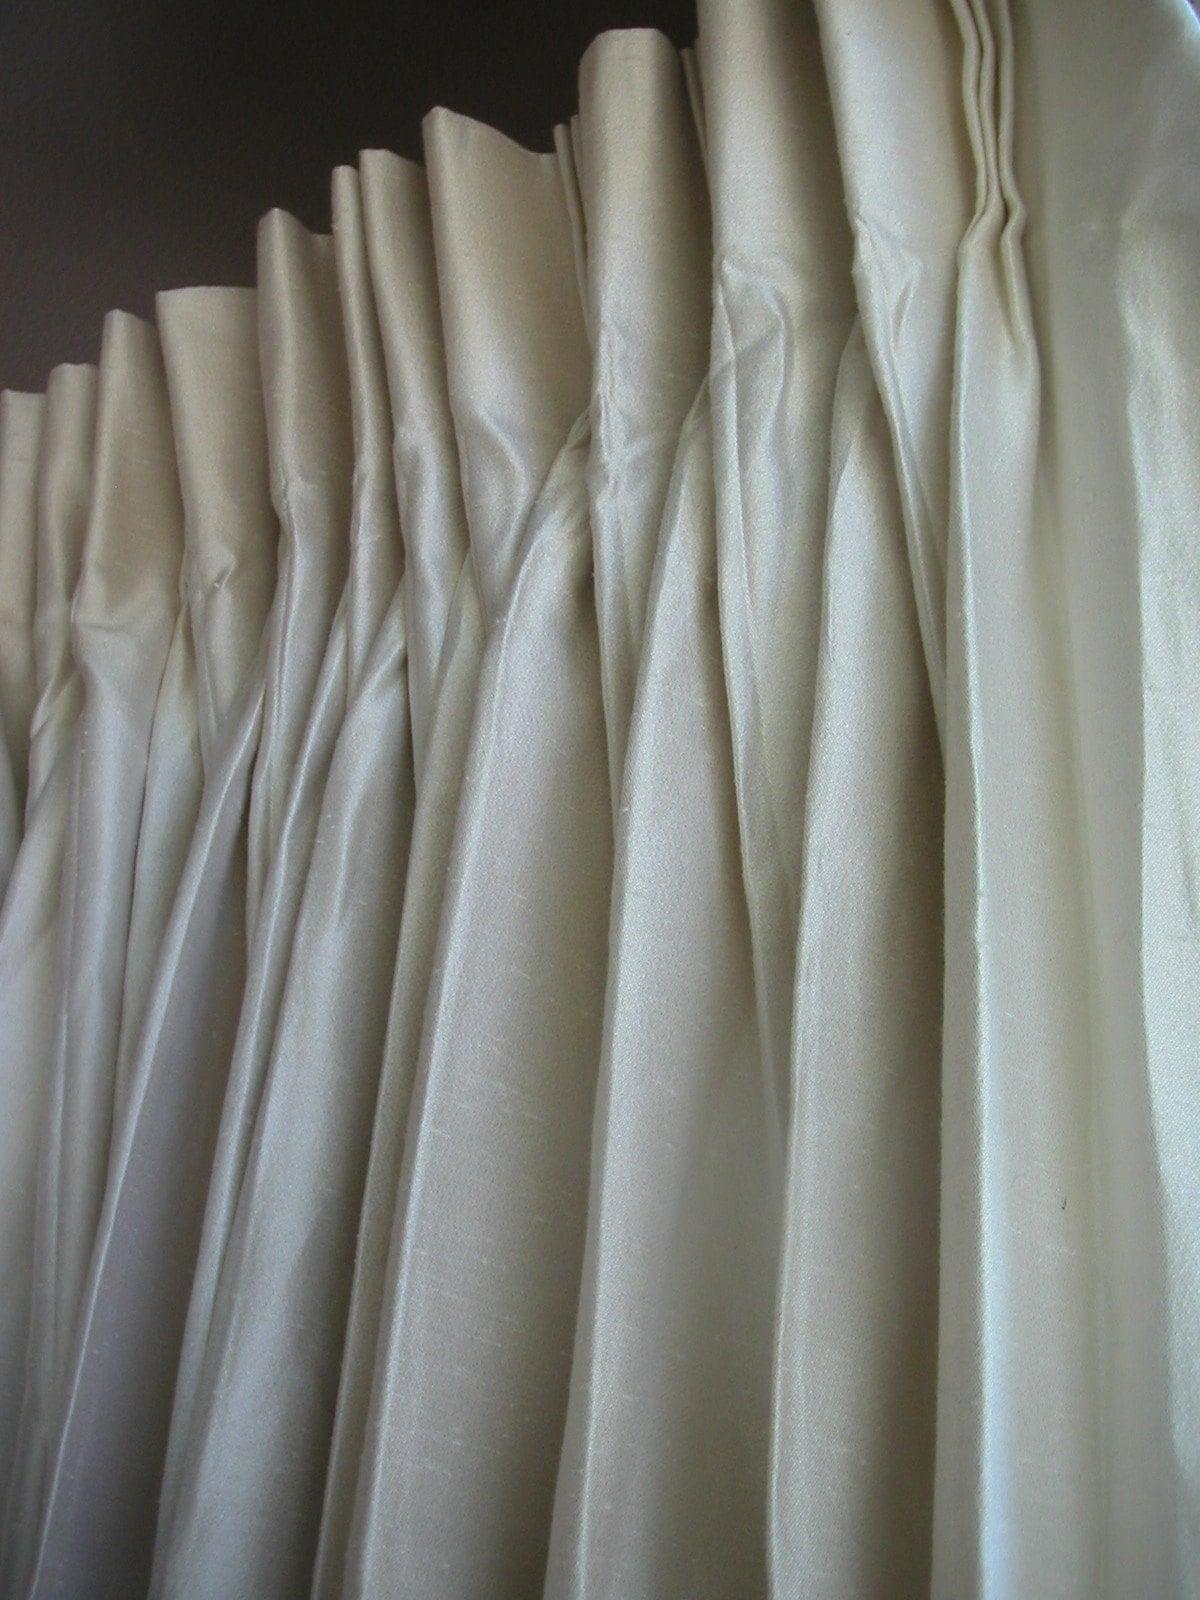 Vintage Cream Colored Curtains By Calaveras On Etsy